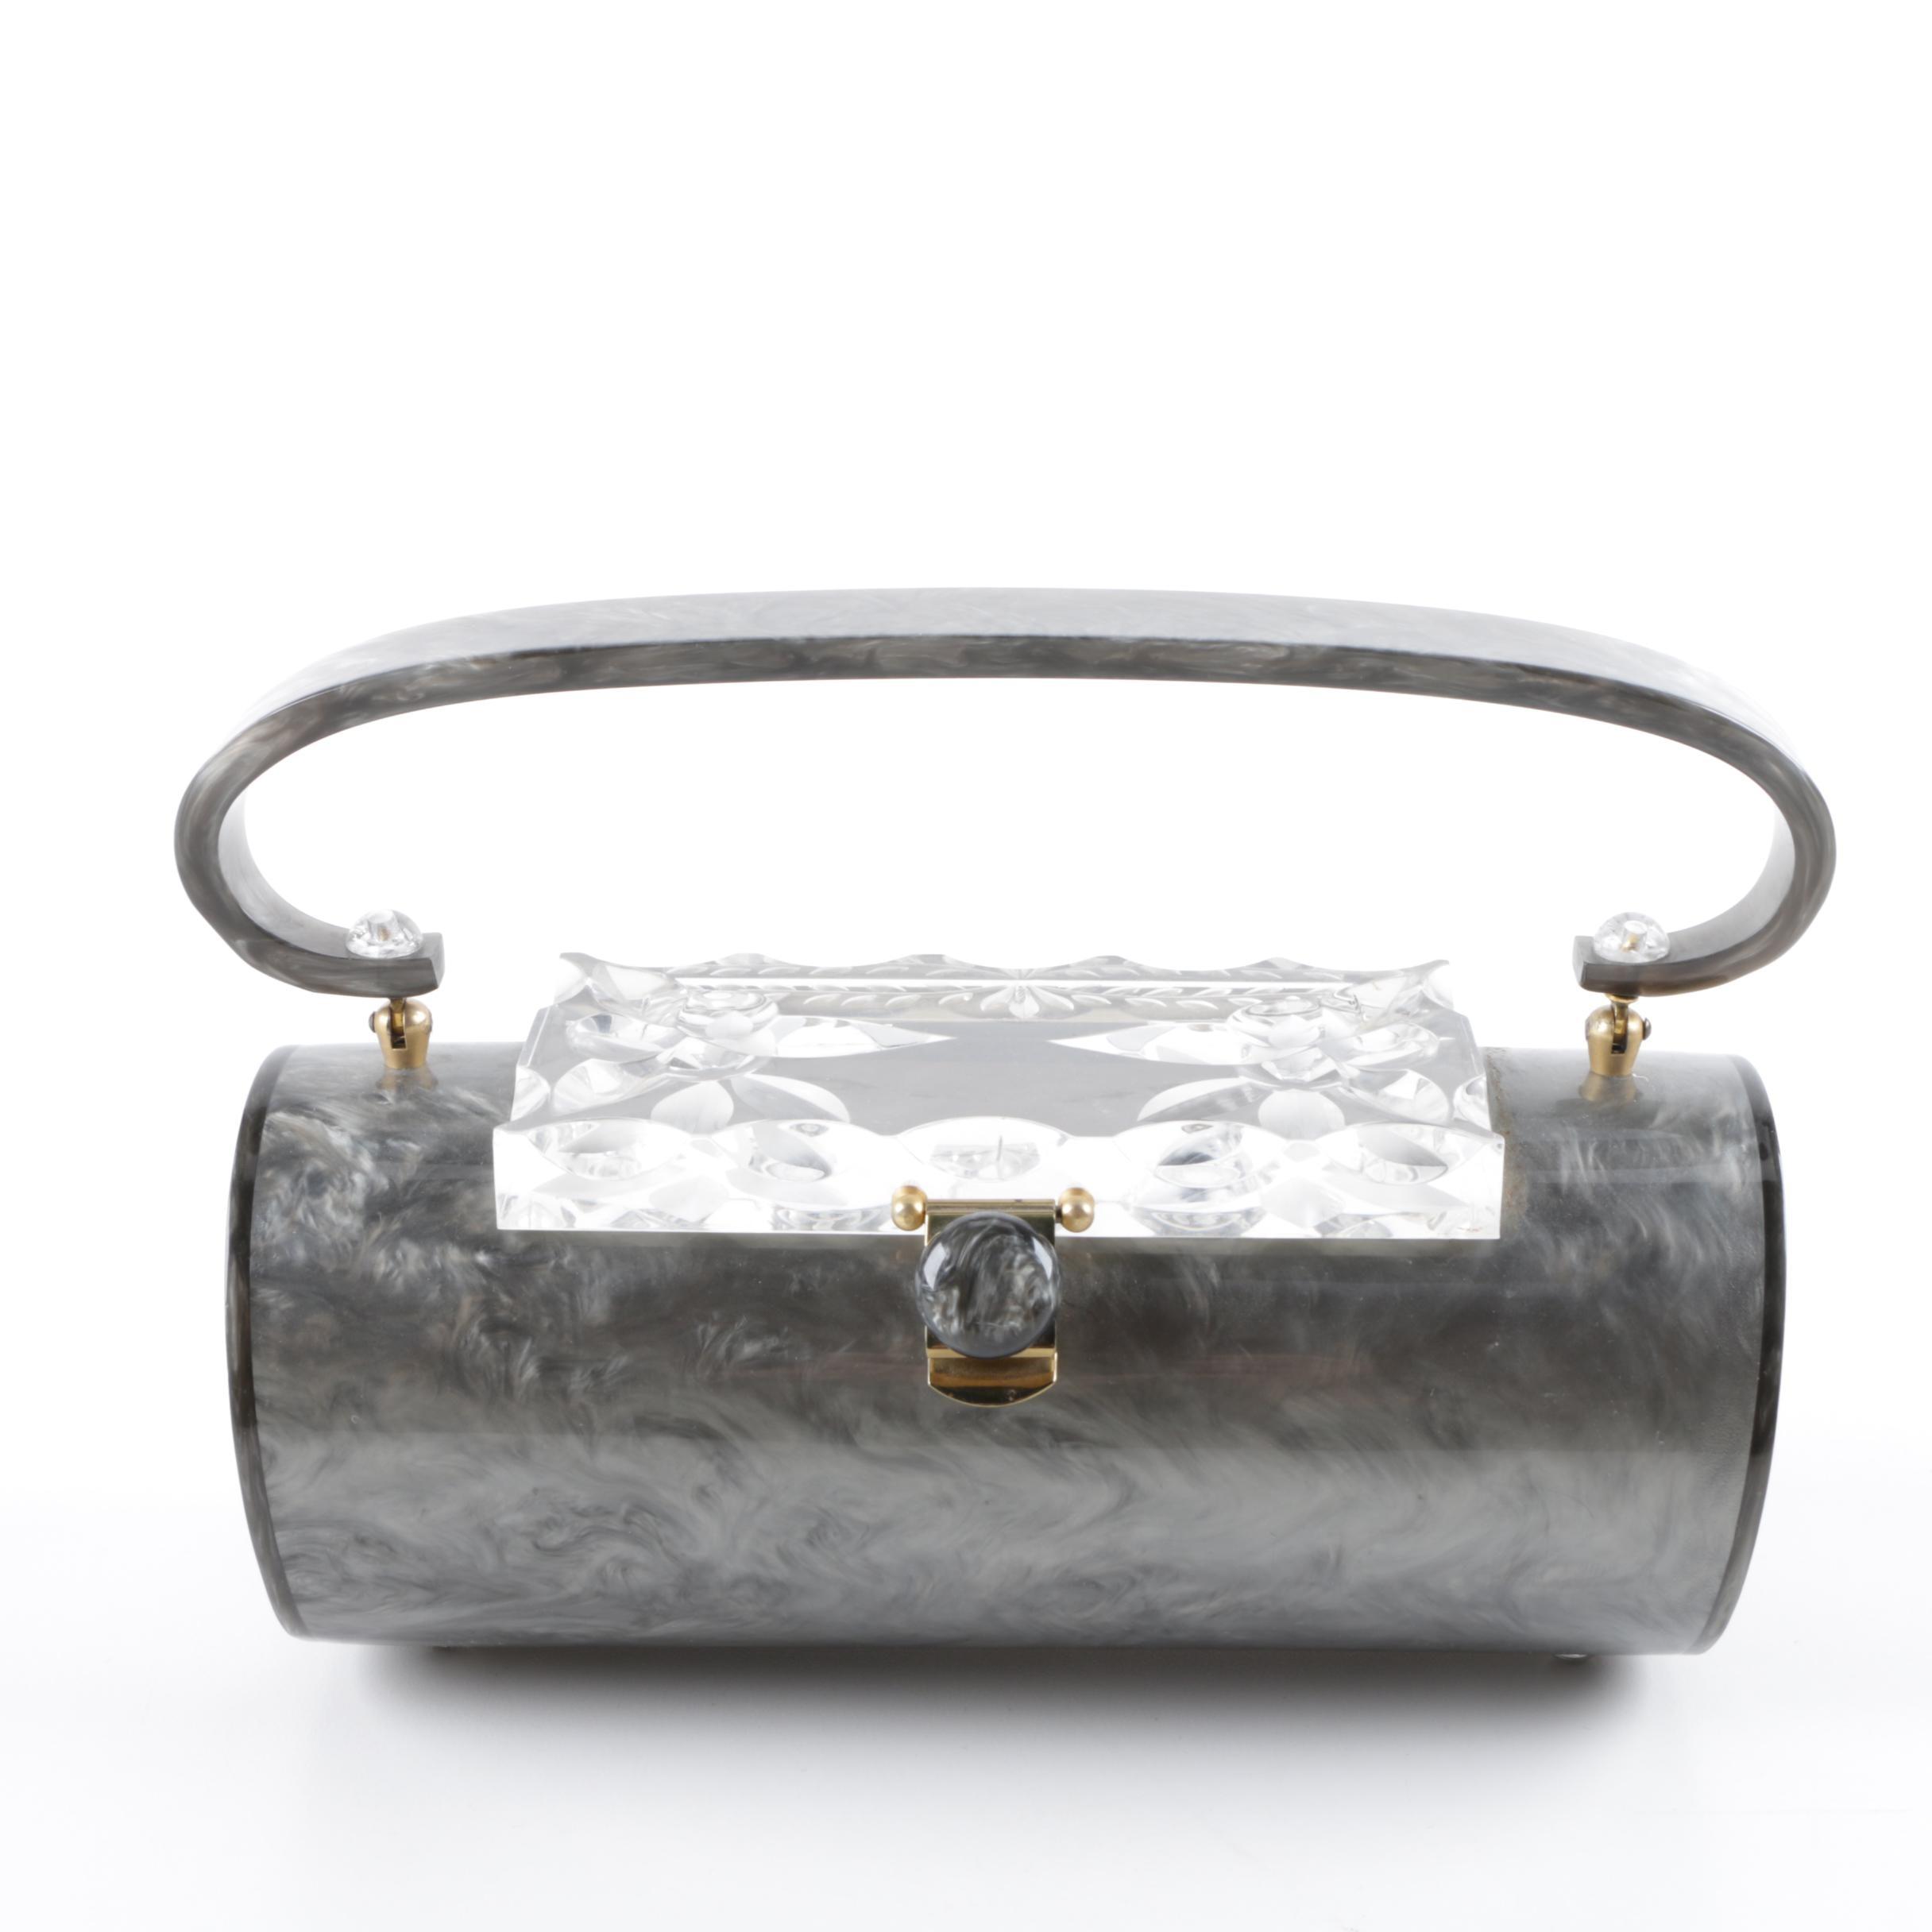 Vintage Lucite Top Handle Handbag